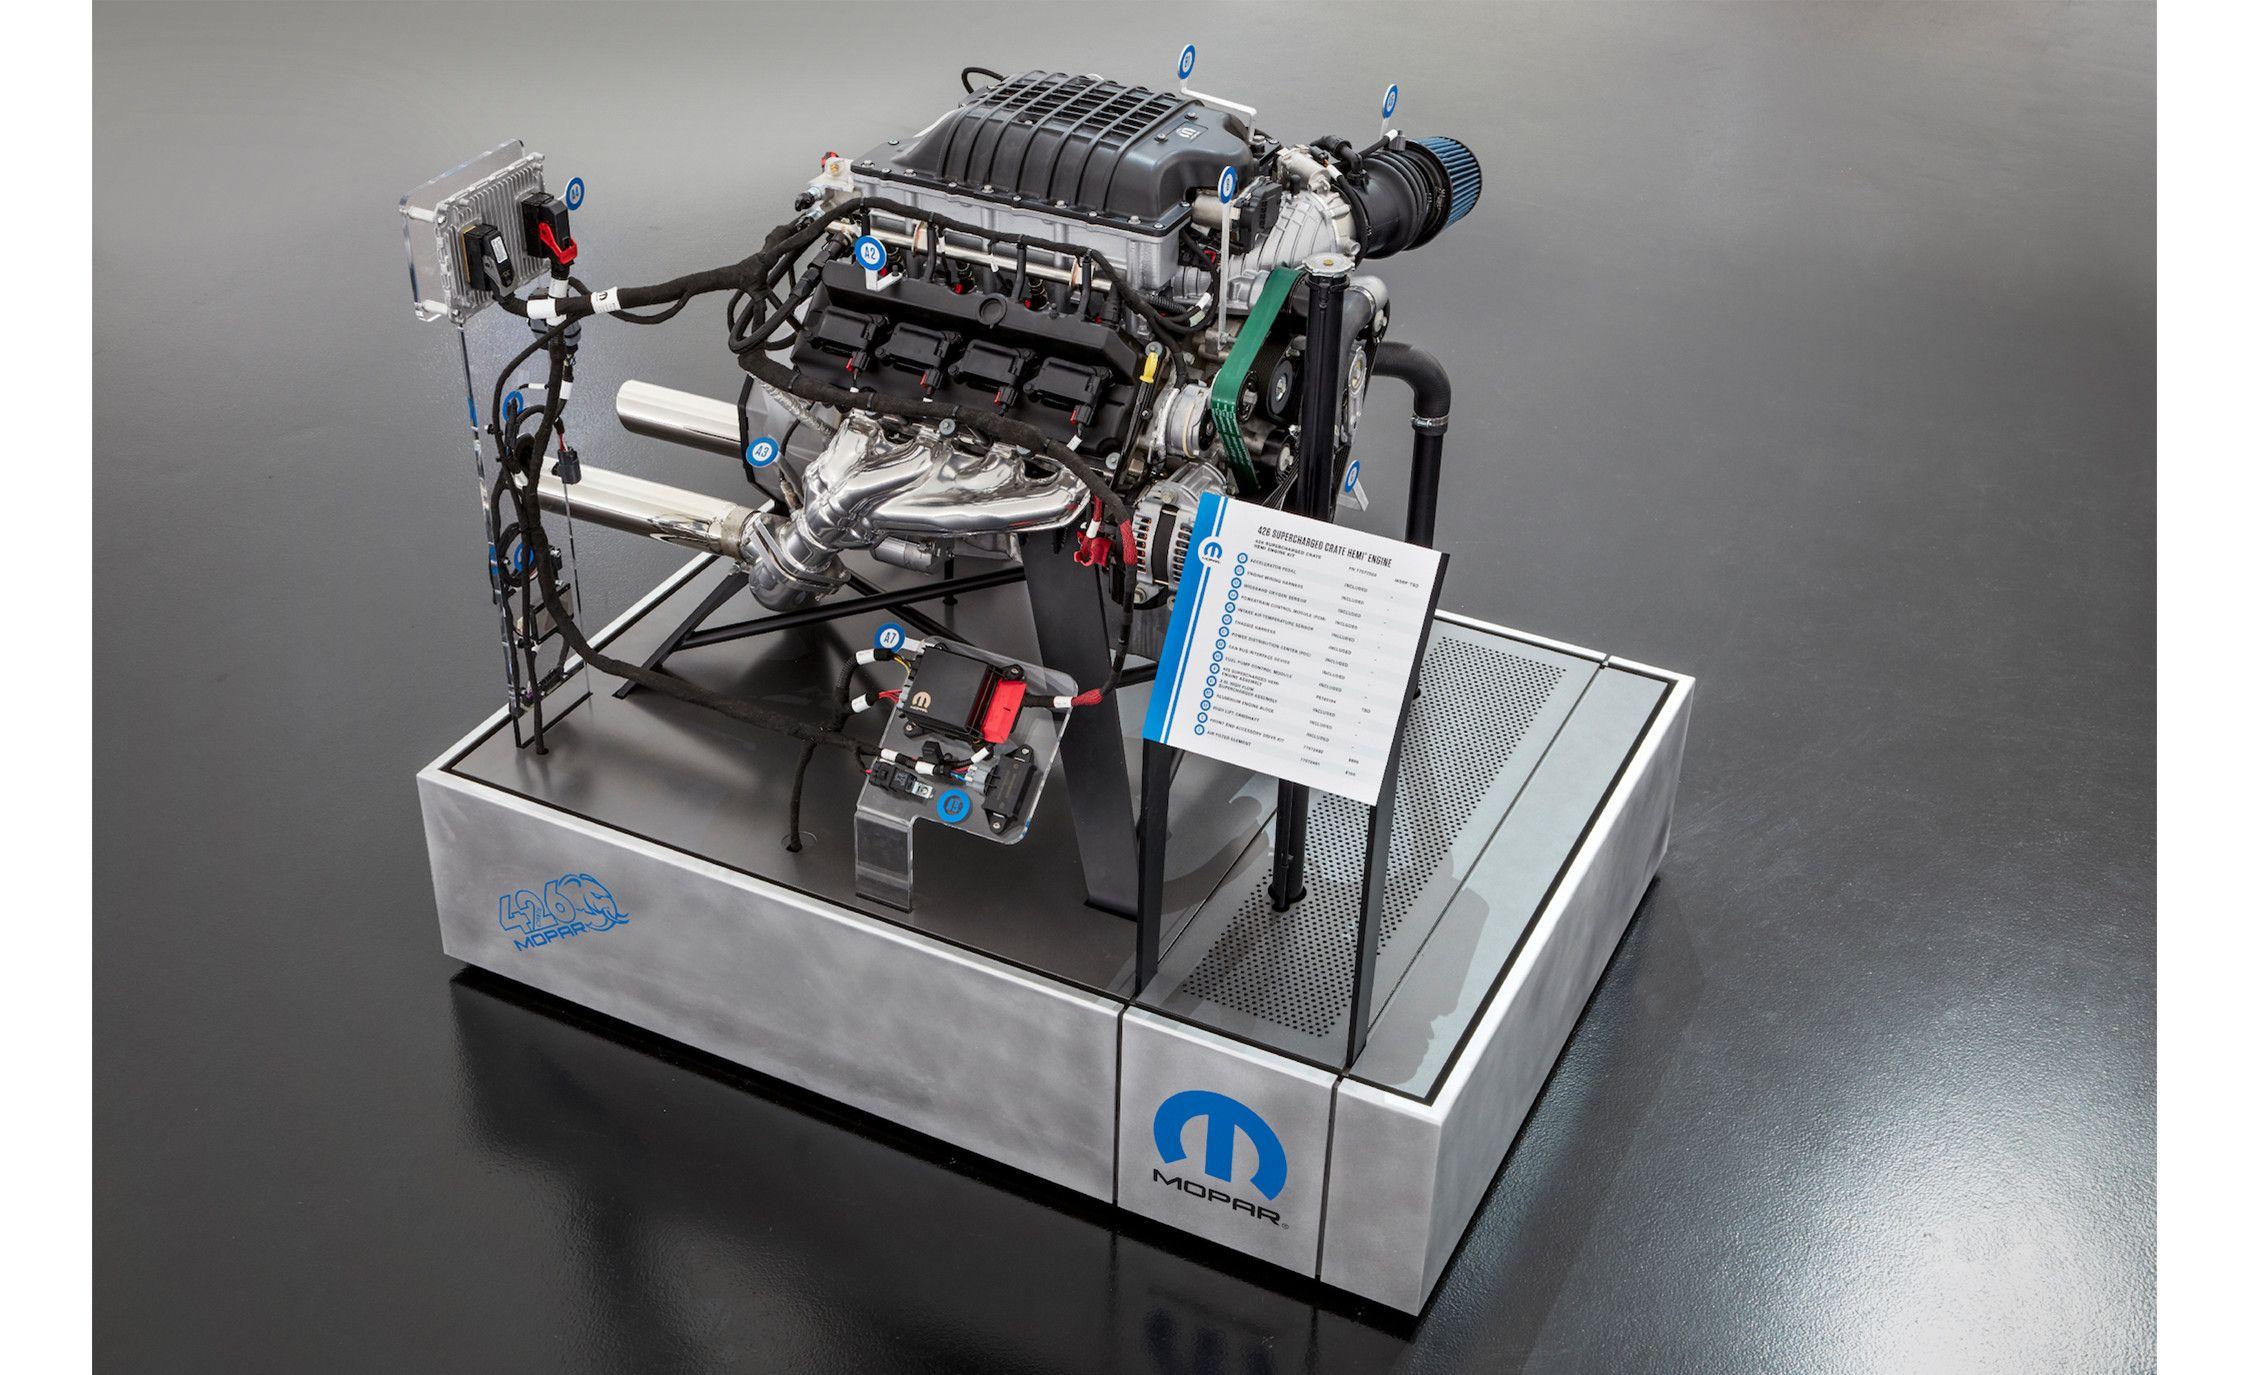 See and Hear Chrysler's 1000-HP Mopar 426 Hemi Crate Engine